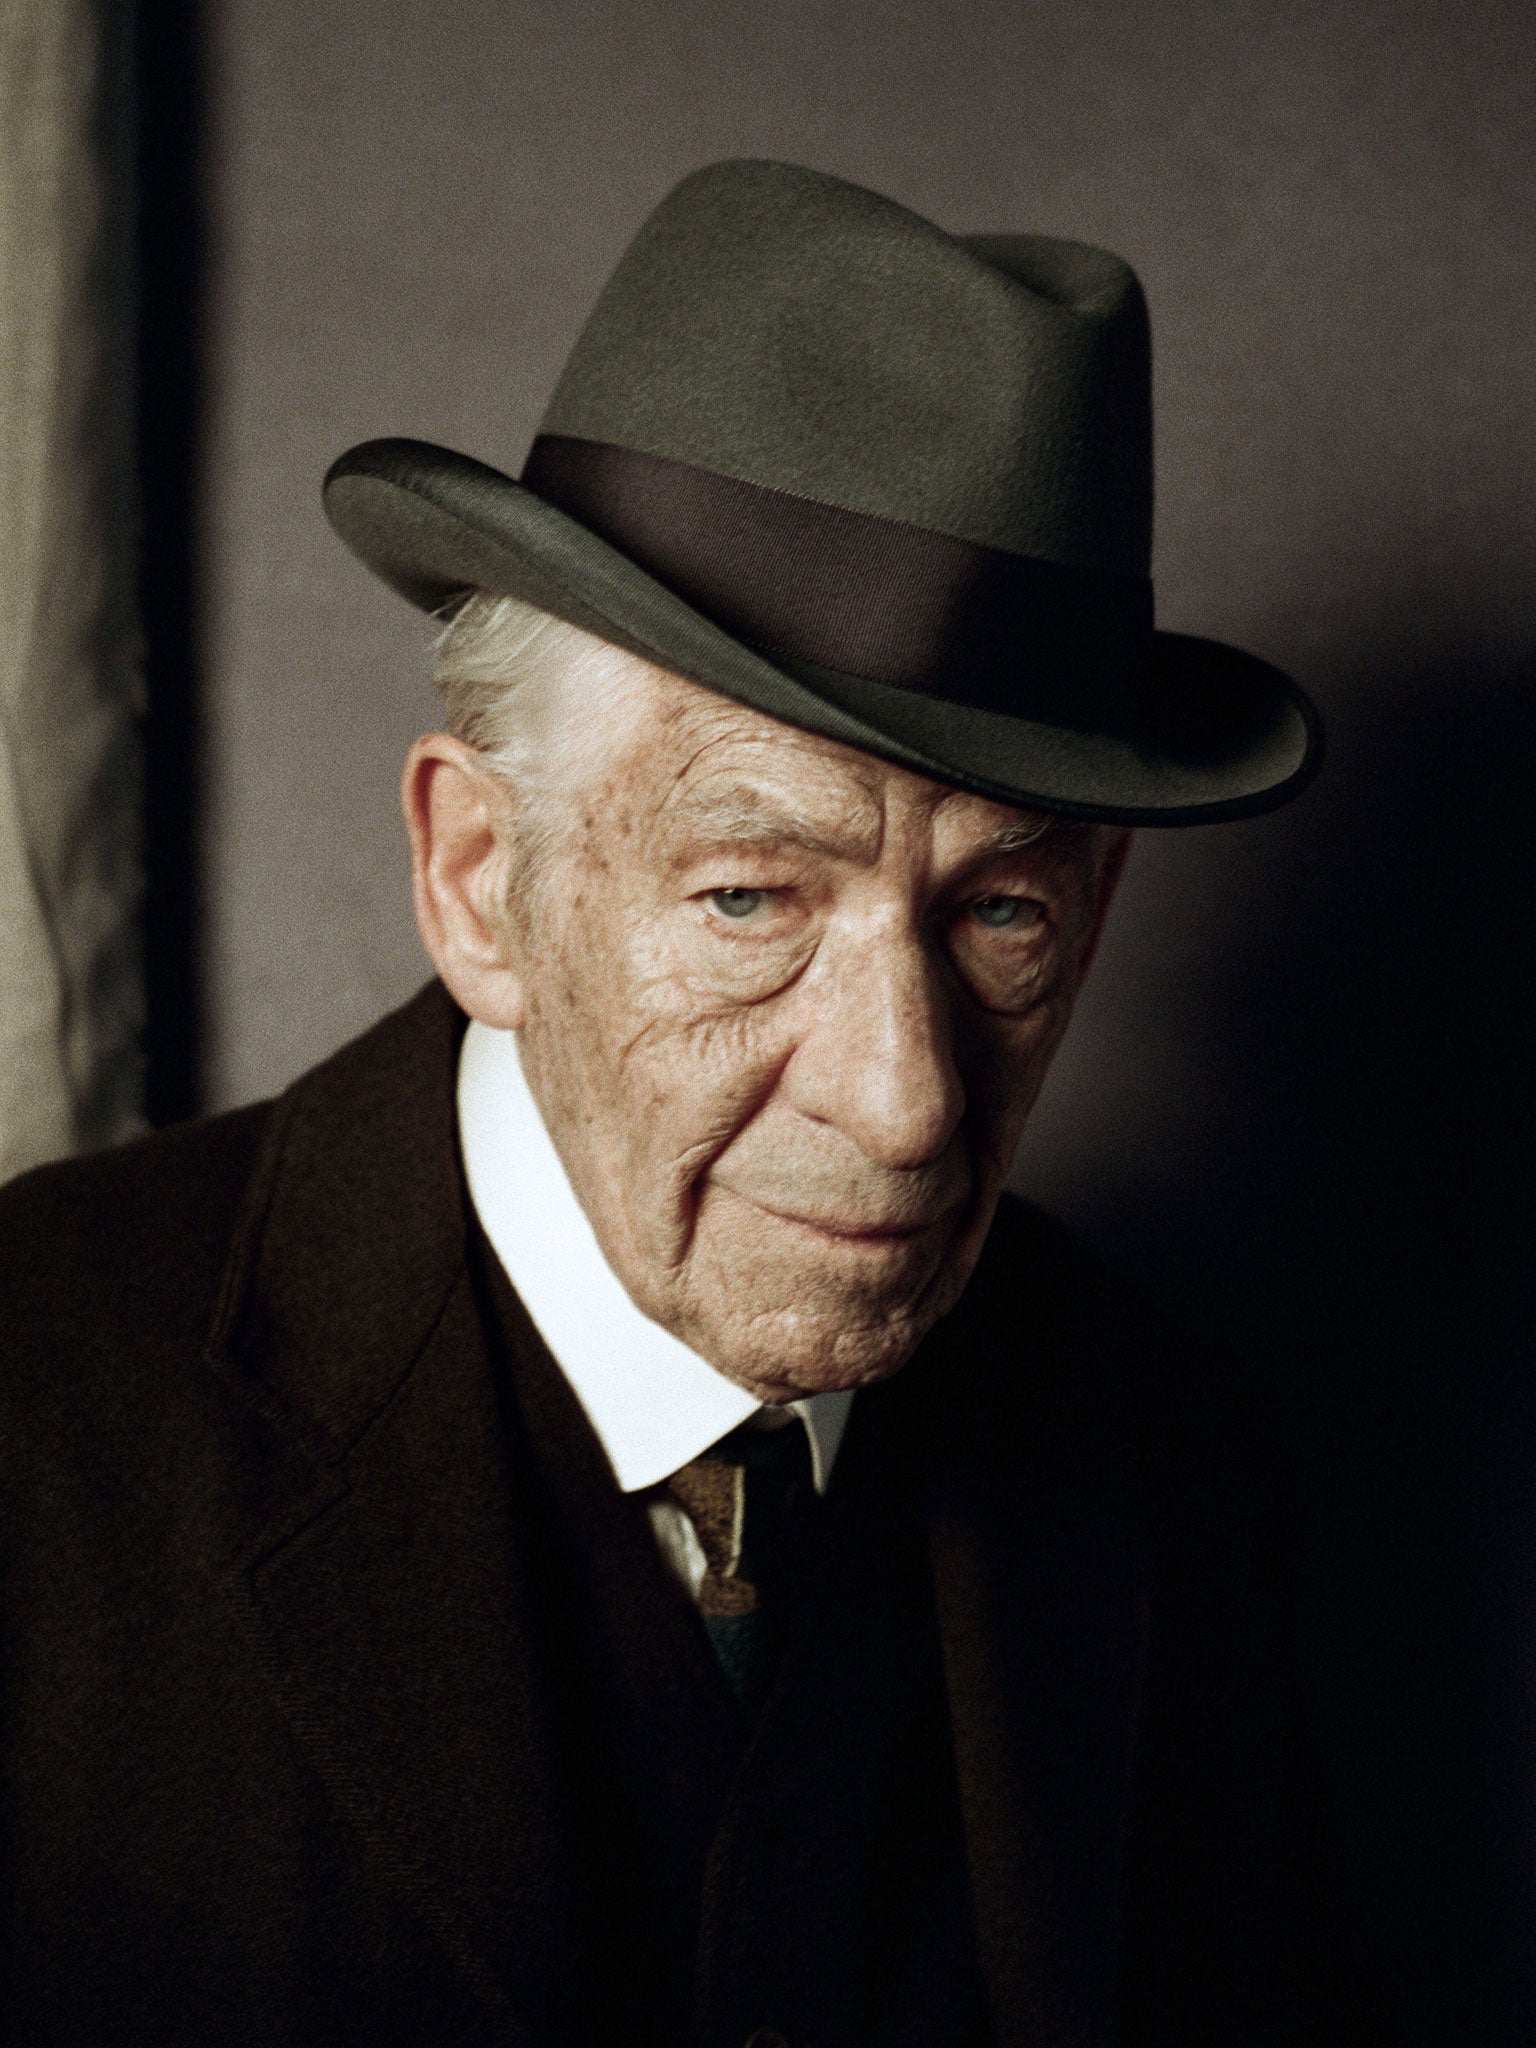 Sir Ian McKellen 'turned down £1million to officiate wedding